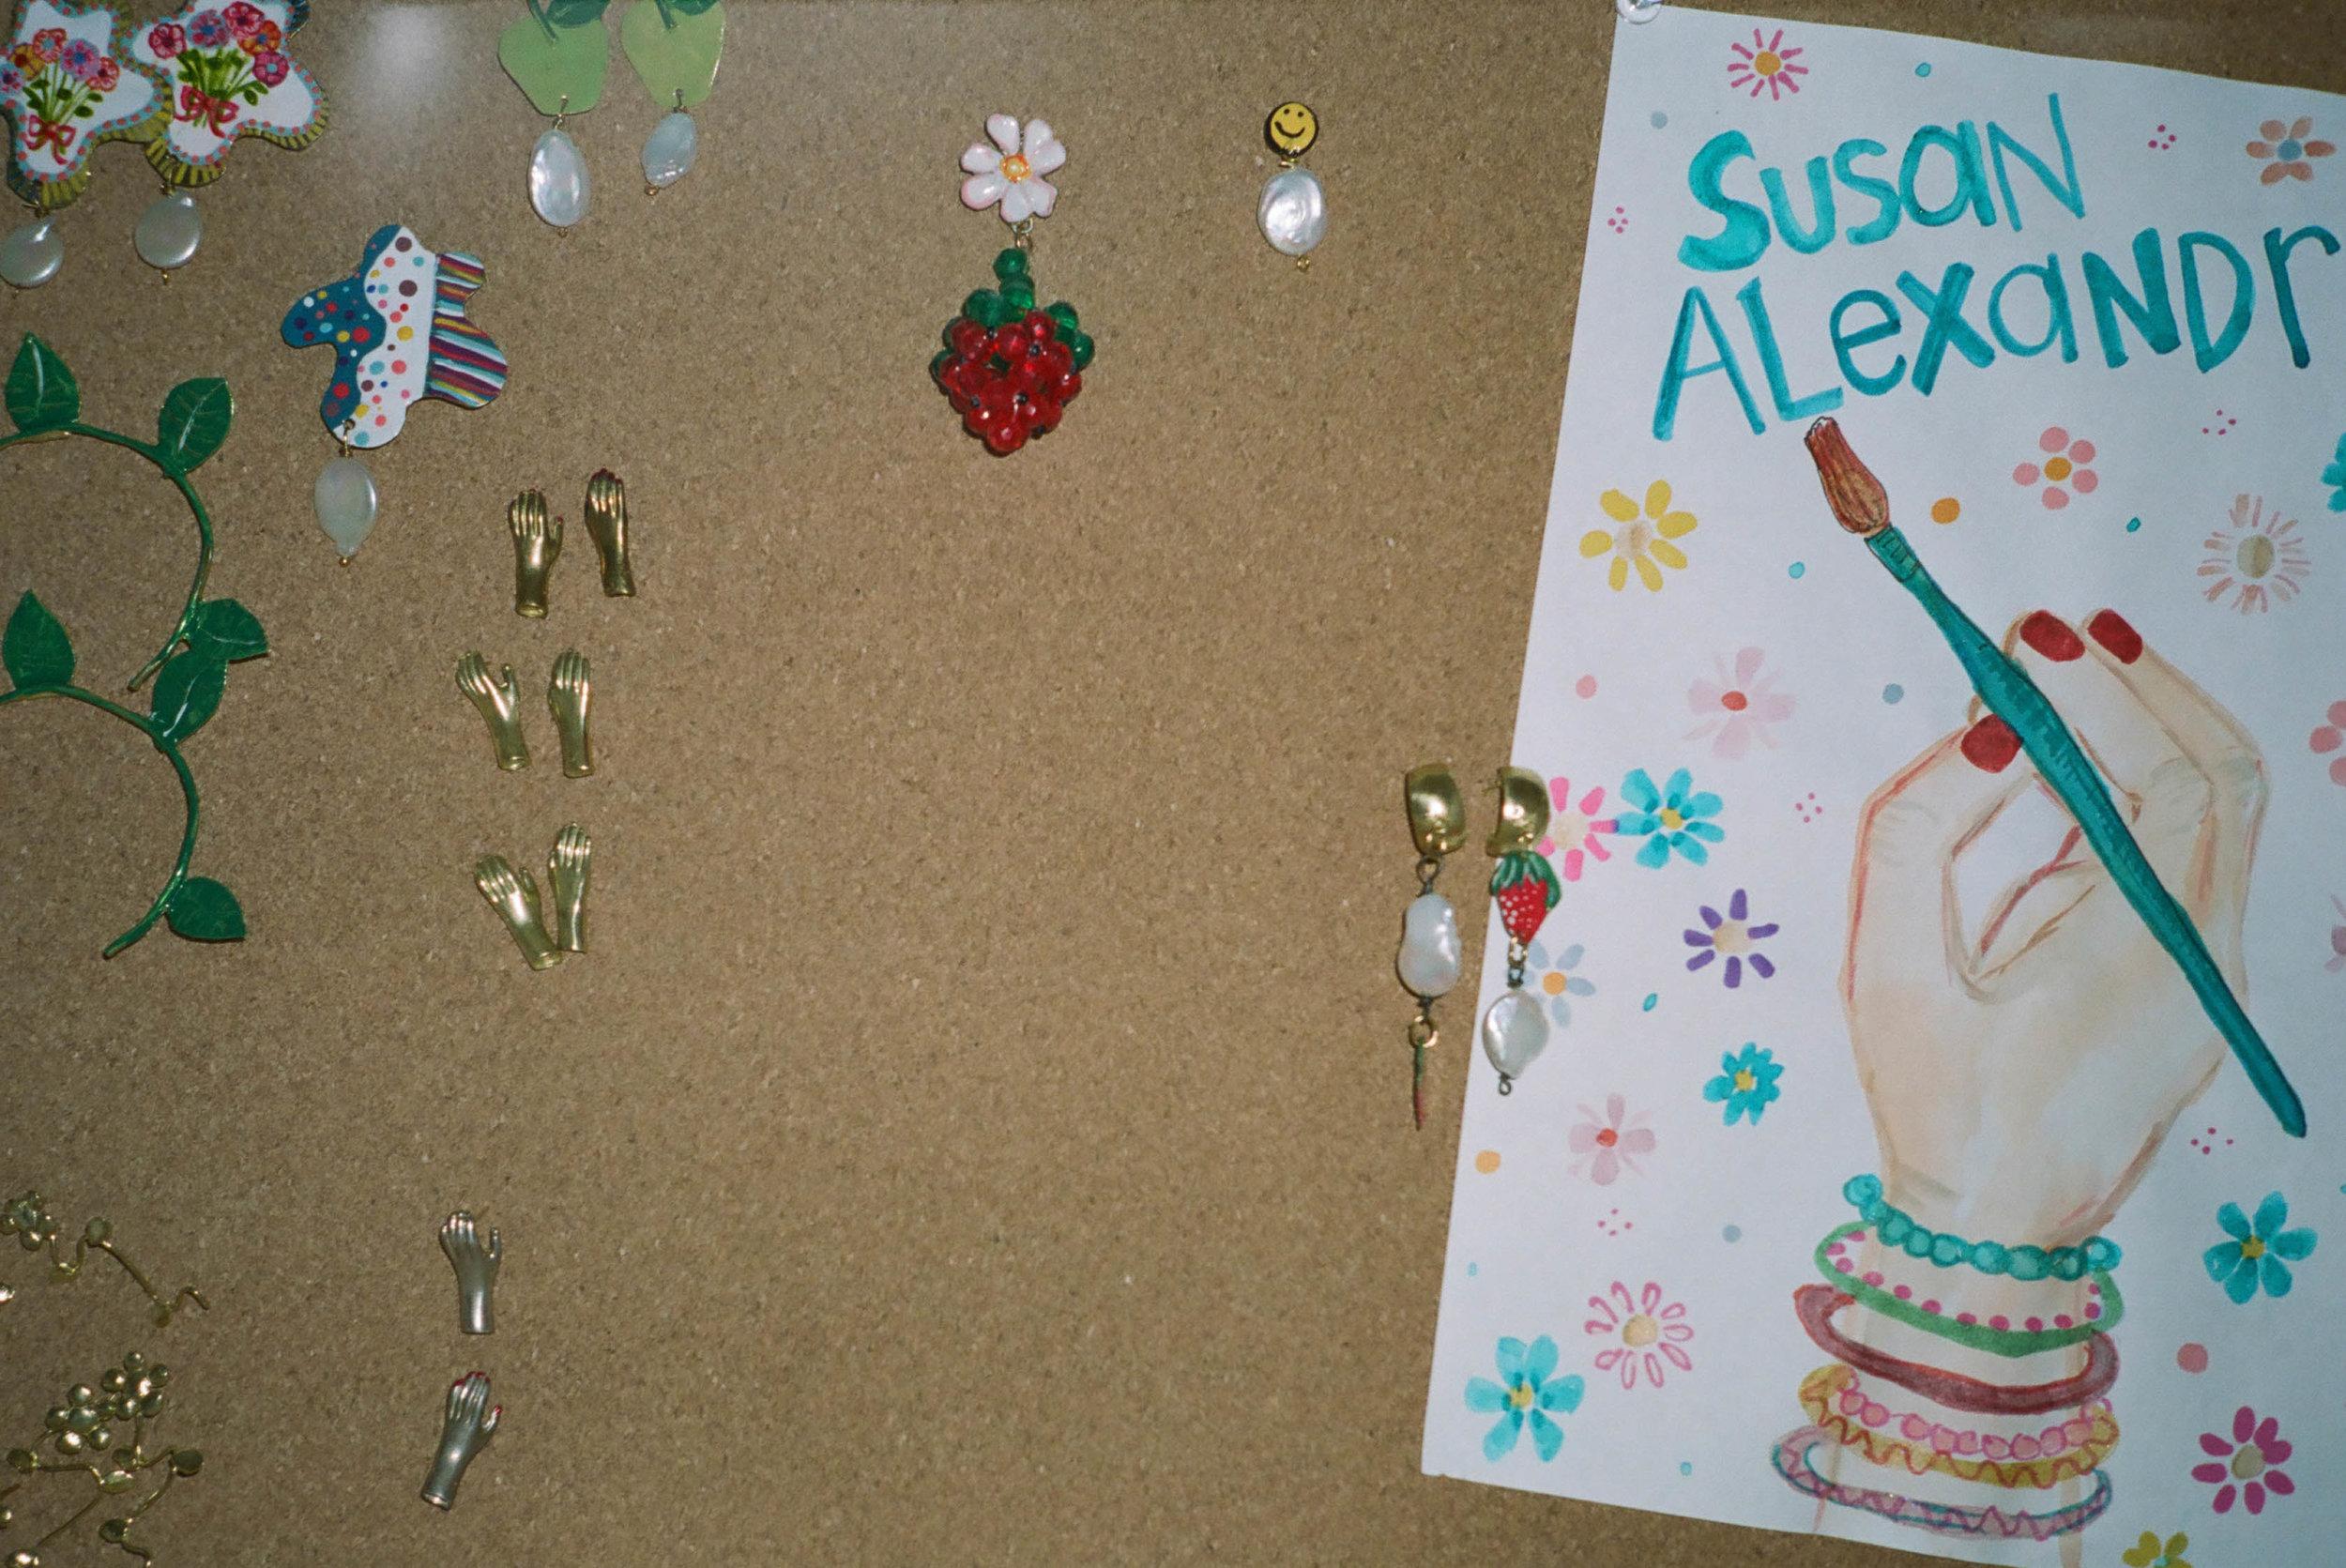 Susan Alexandra for Passerbuys4.jpg